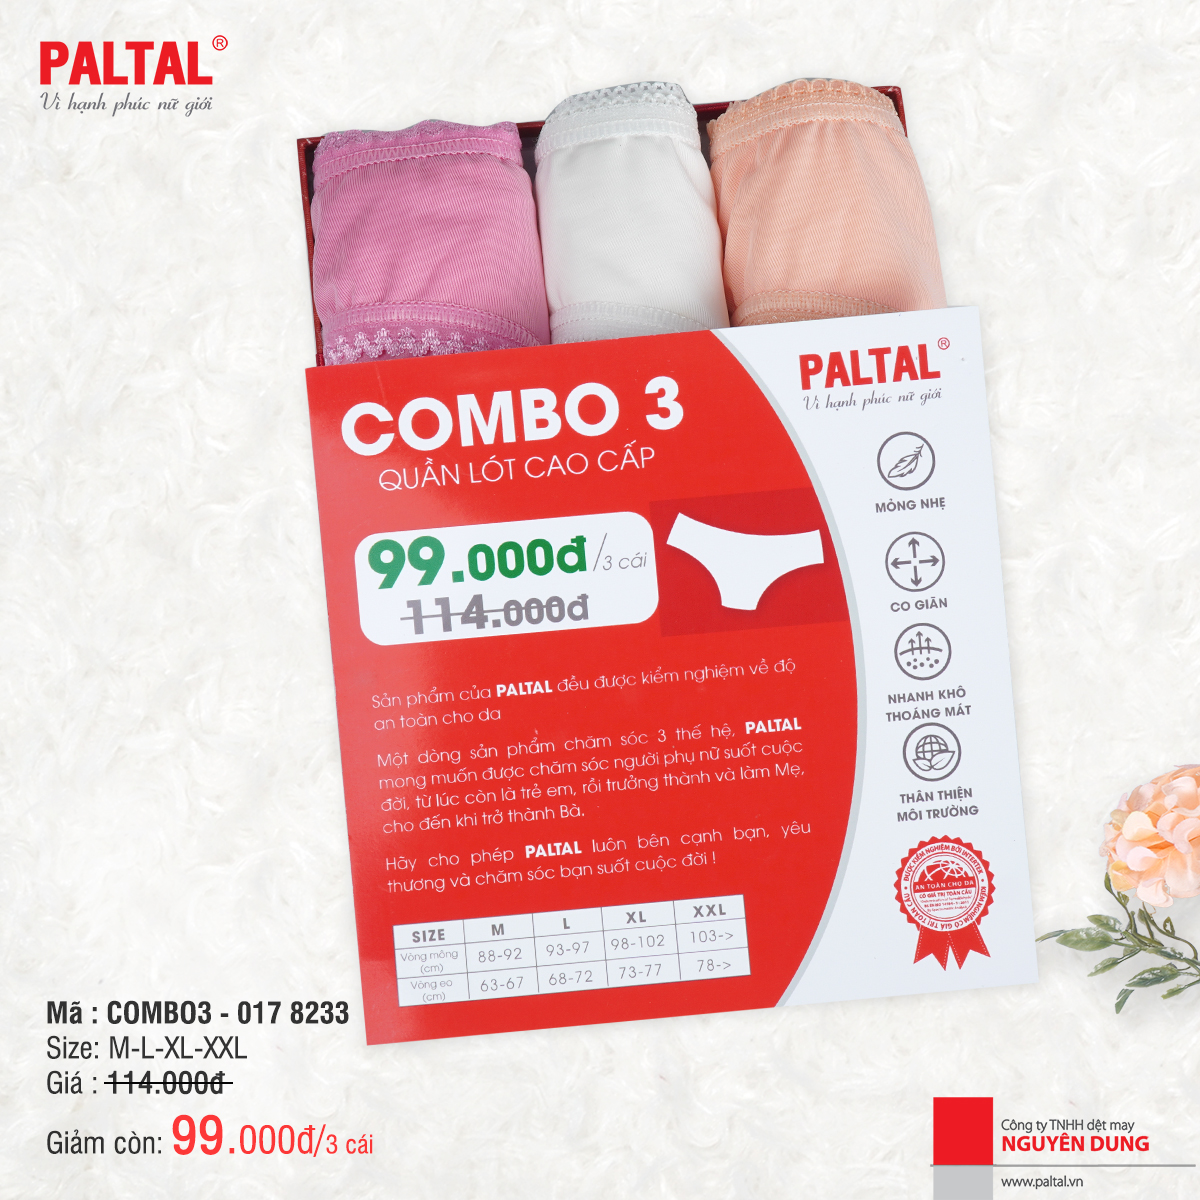 COMBO 3 QUẦN LÓT CAO CẤP PALTAL QL 017P 8233